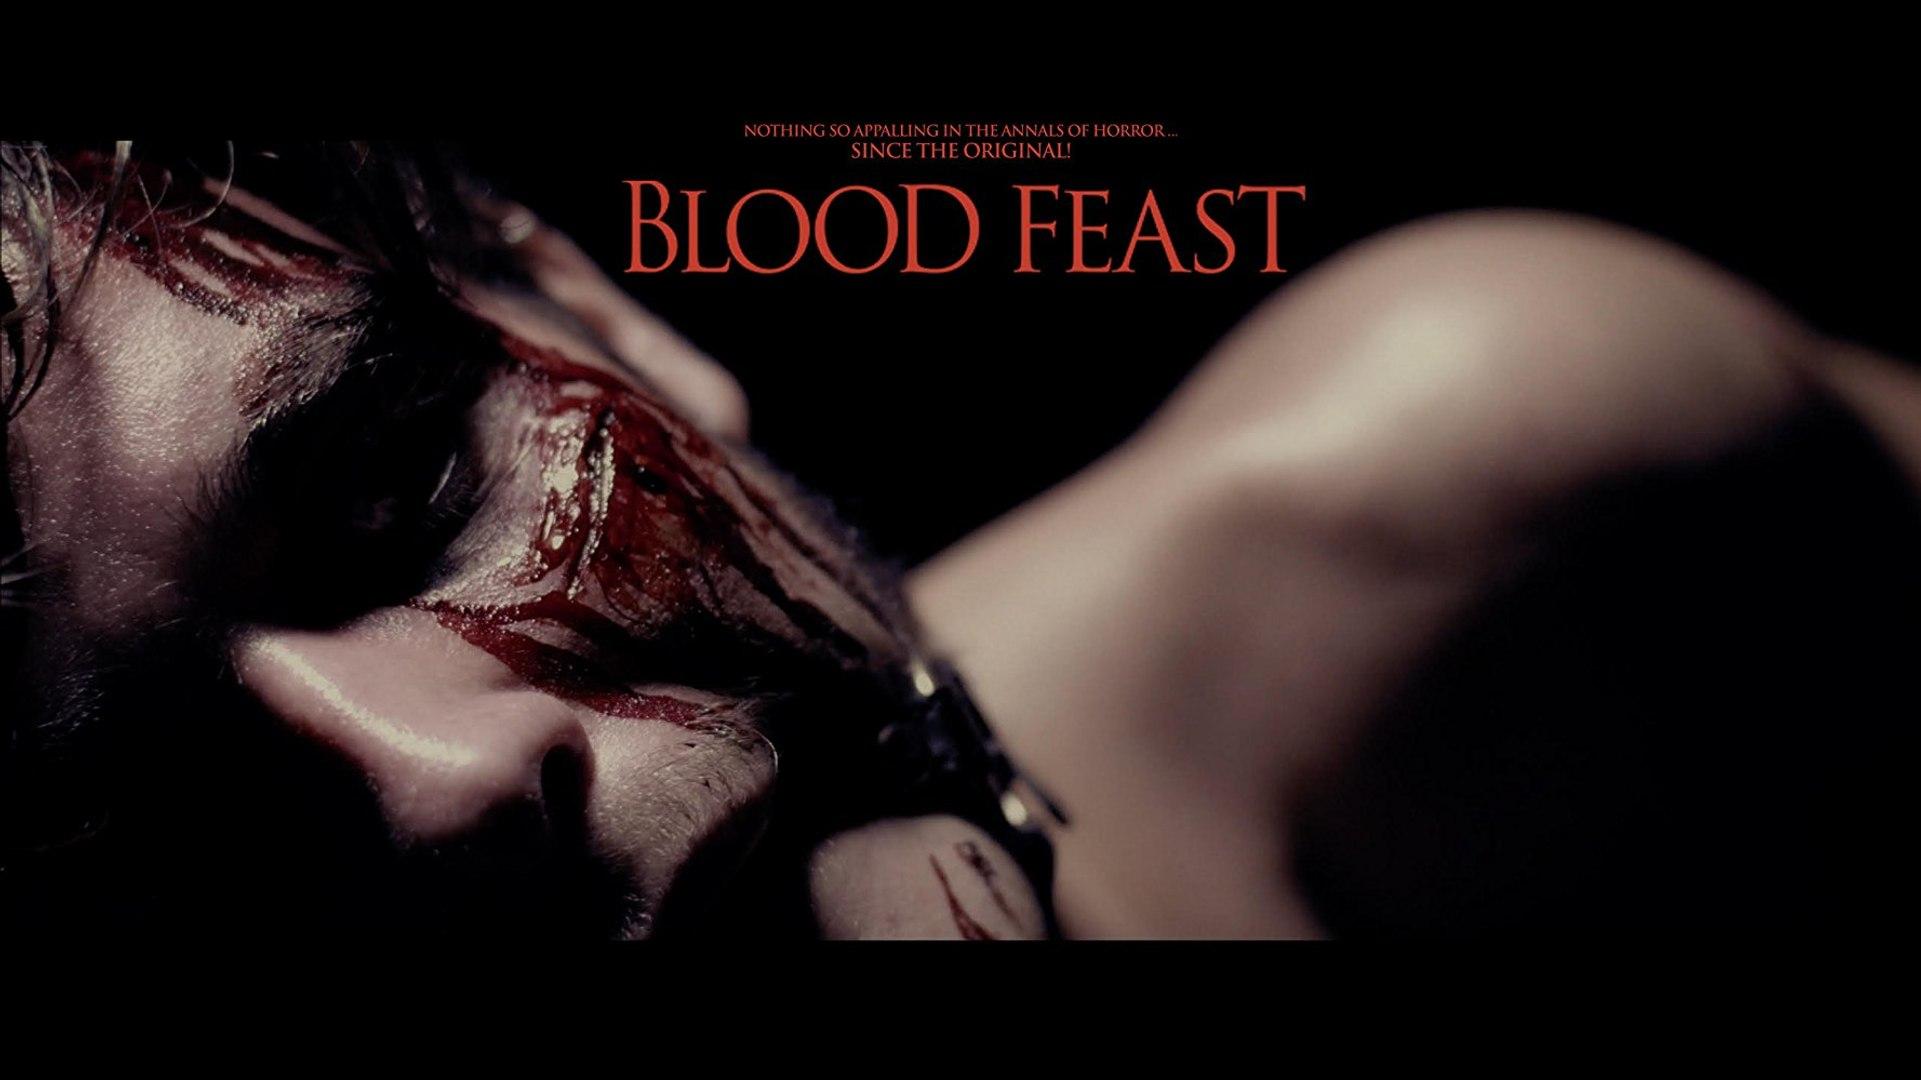 BLOOD FEAST - FULL STREAMING MOVIE '2018